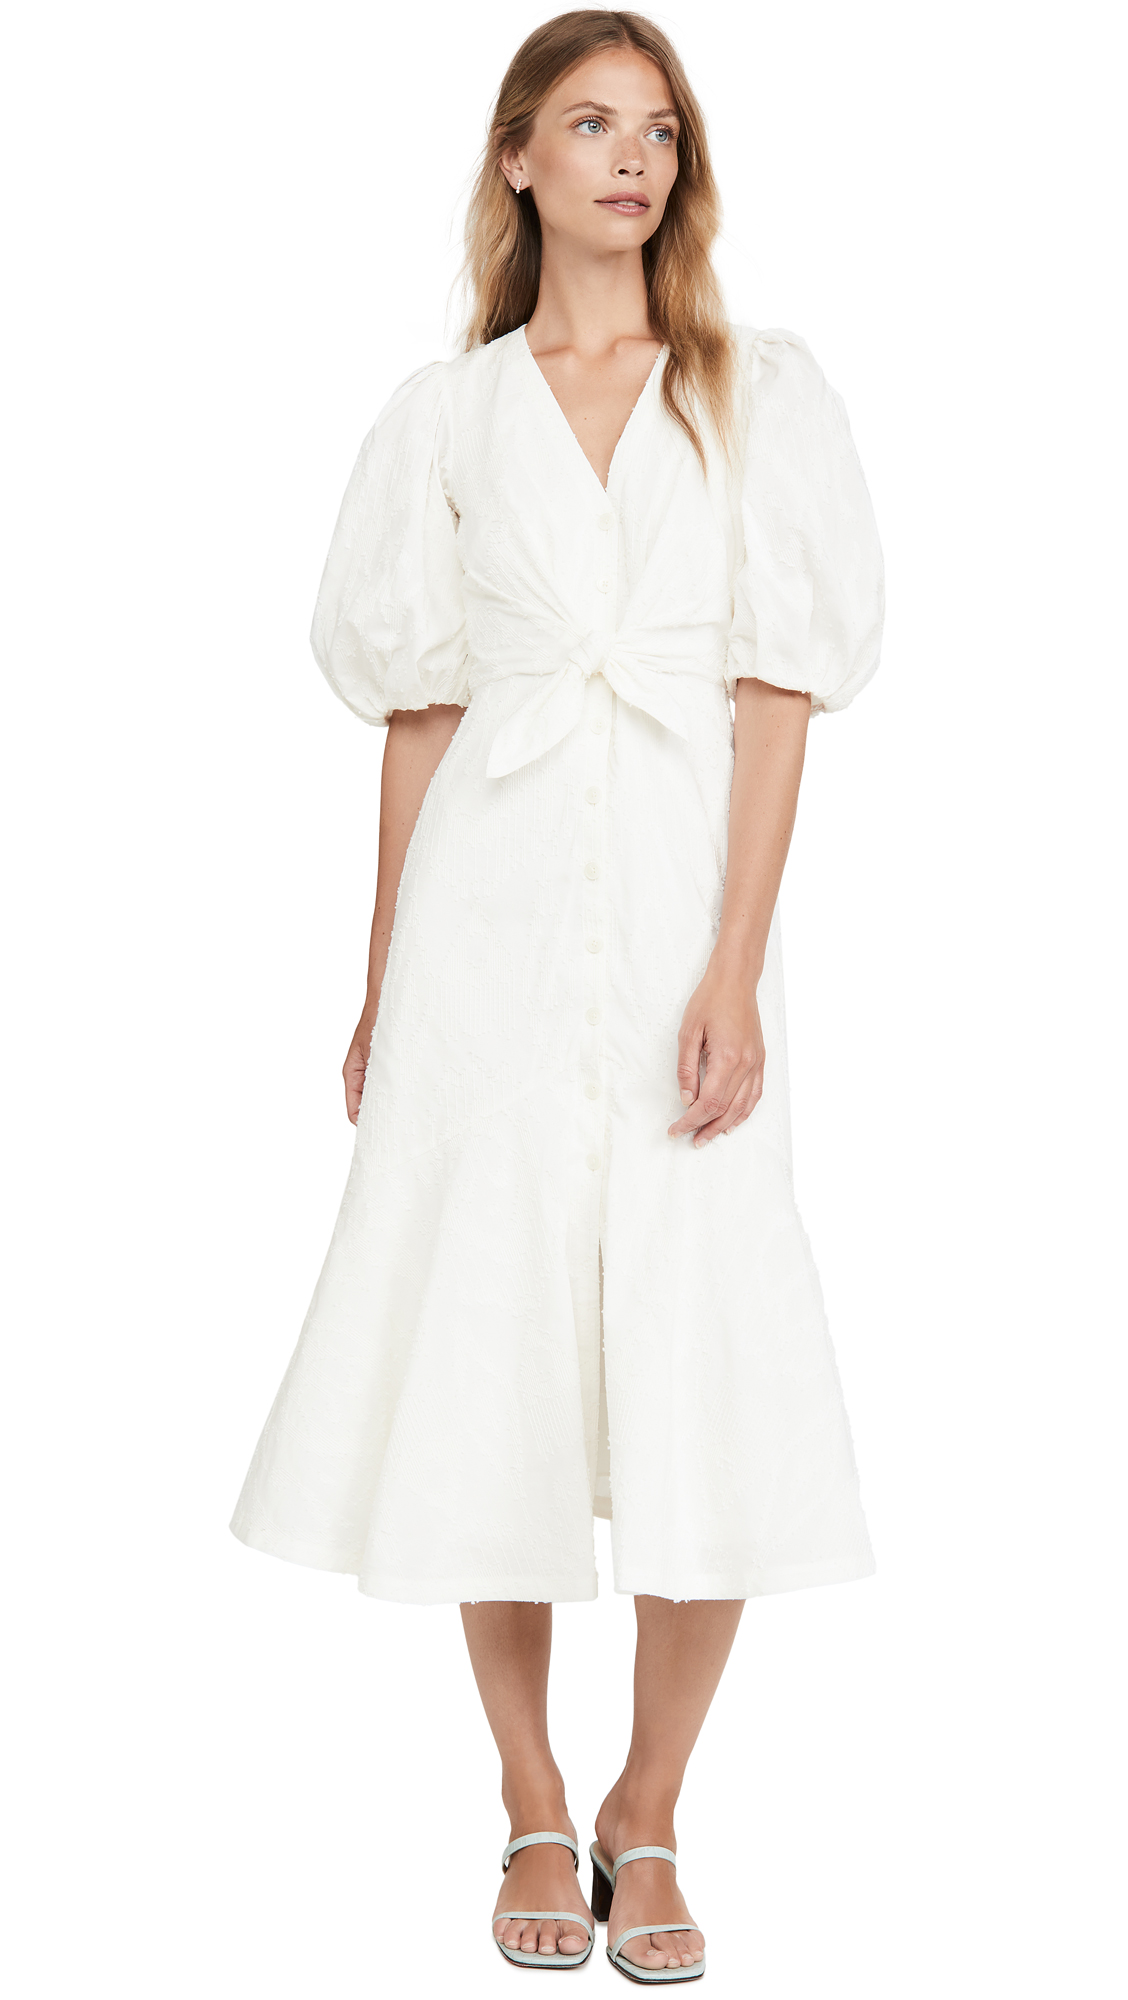 Rebecca Taylor Short Sleeve Textured Ikat Dress